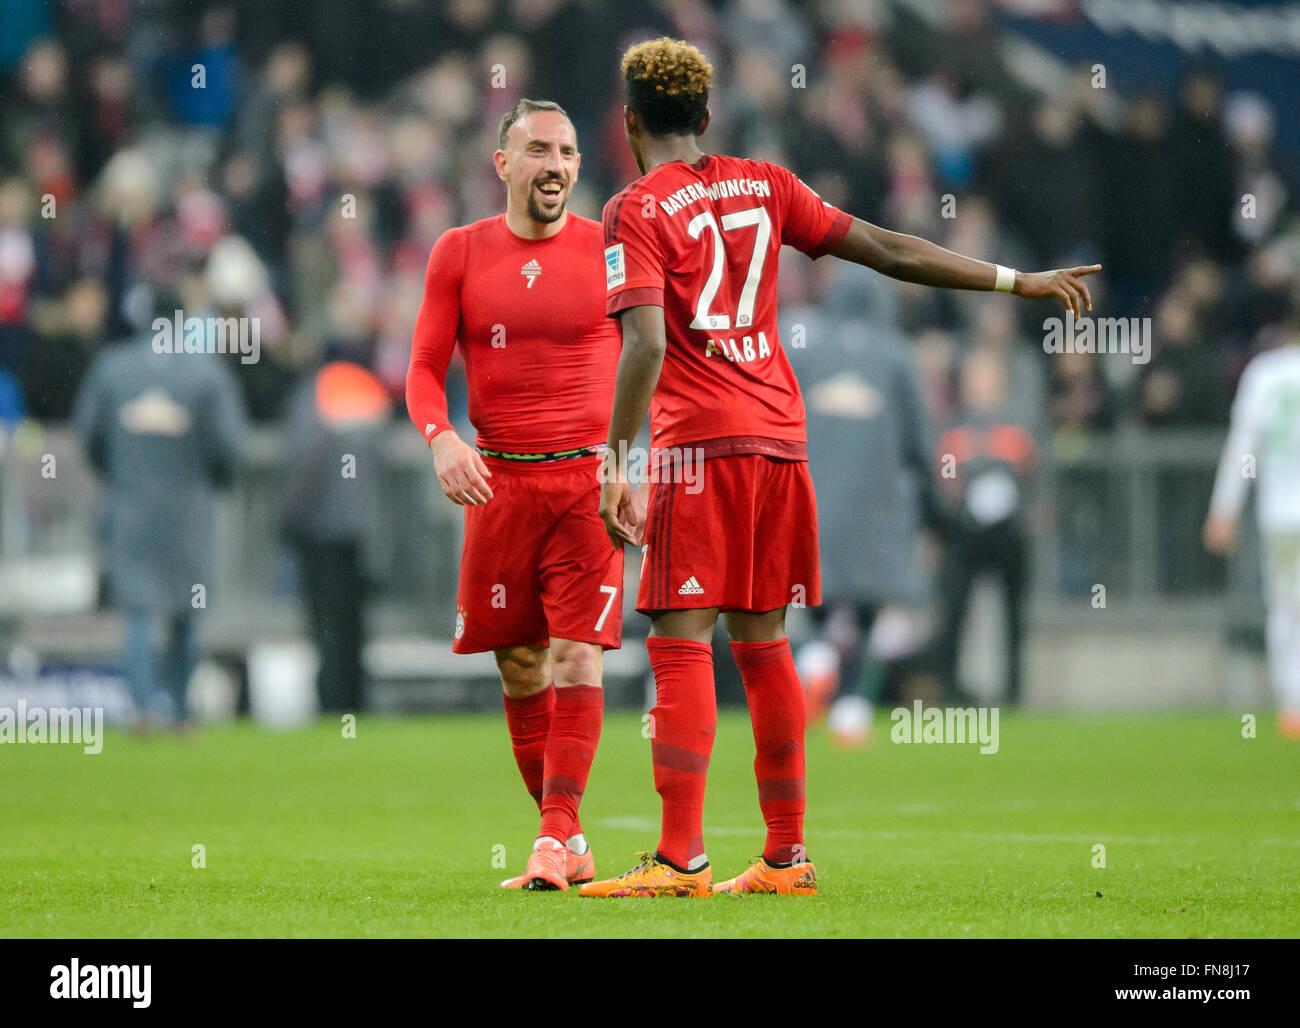 Munich Germany 12th Mar 2016 Munich s Franck Ribery L and